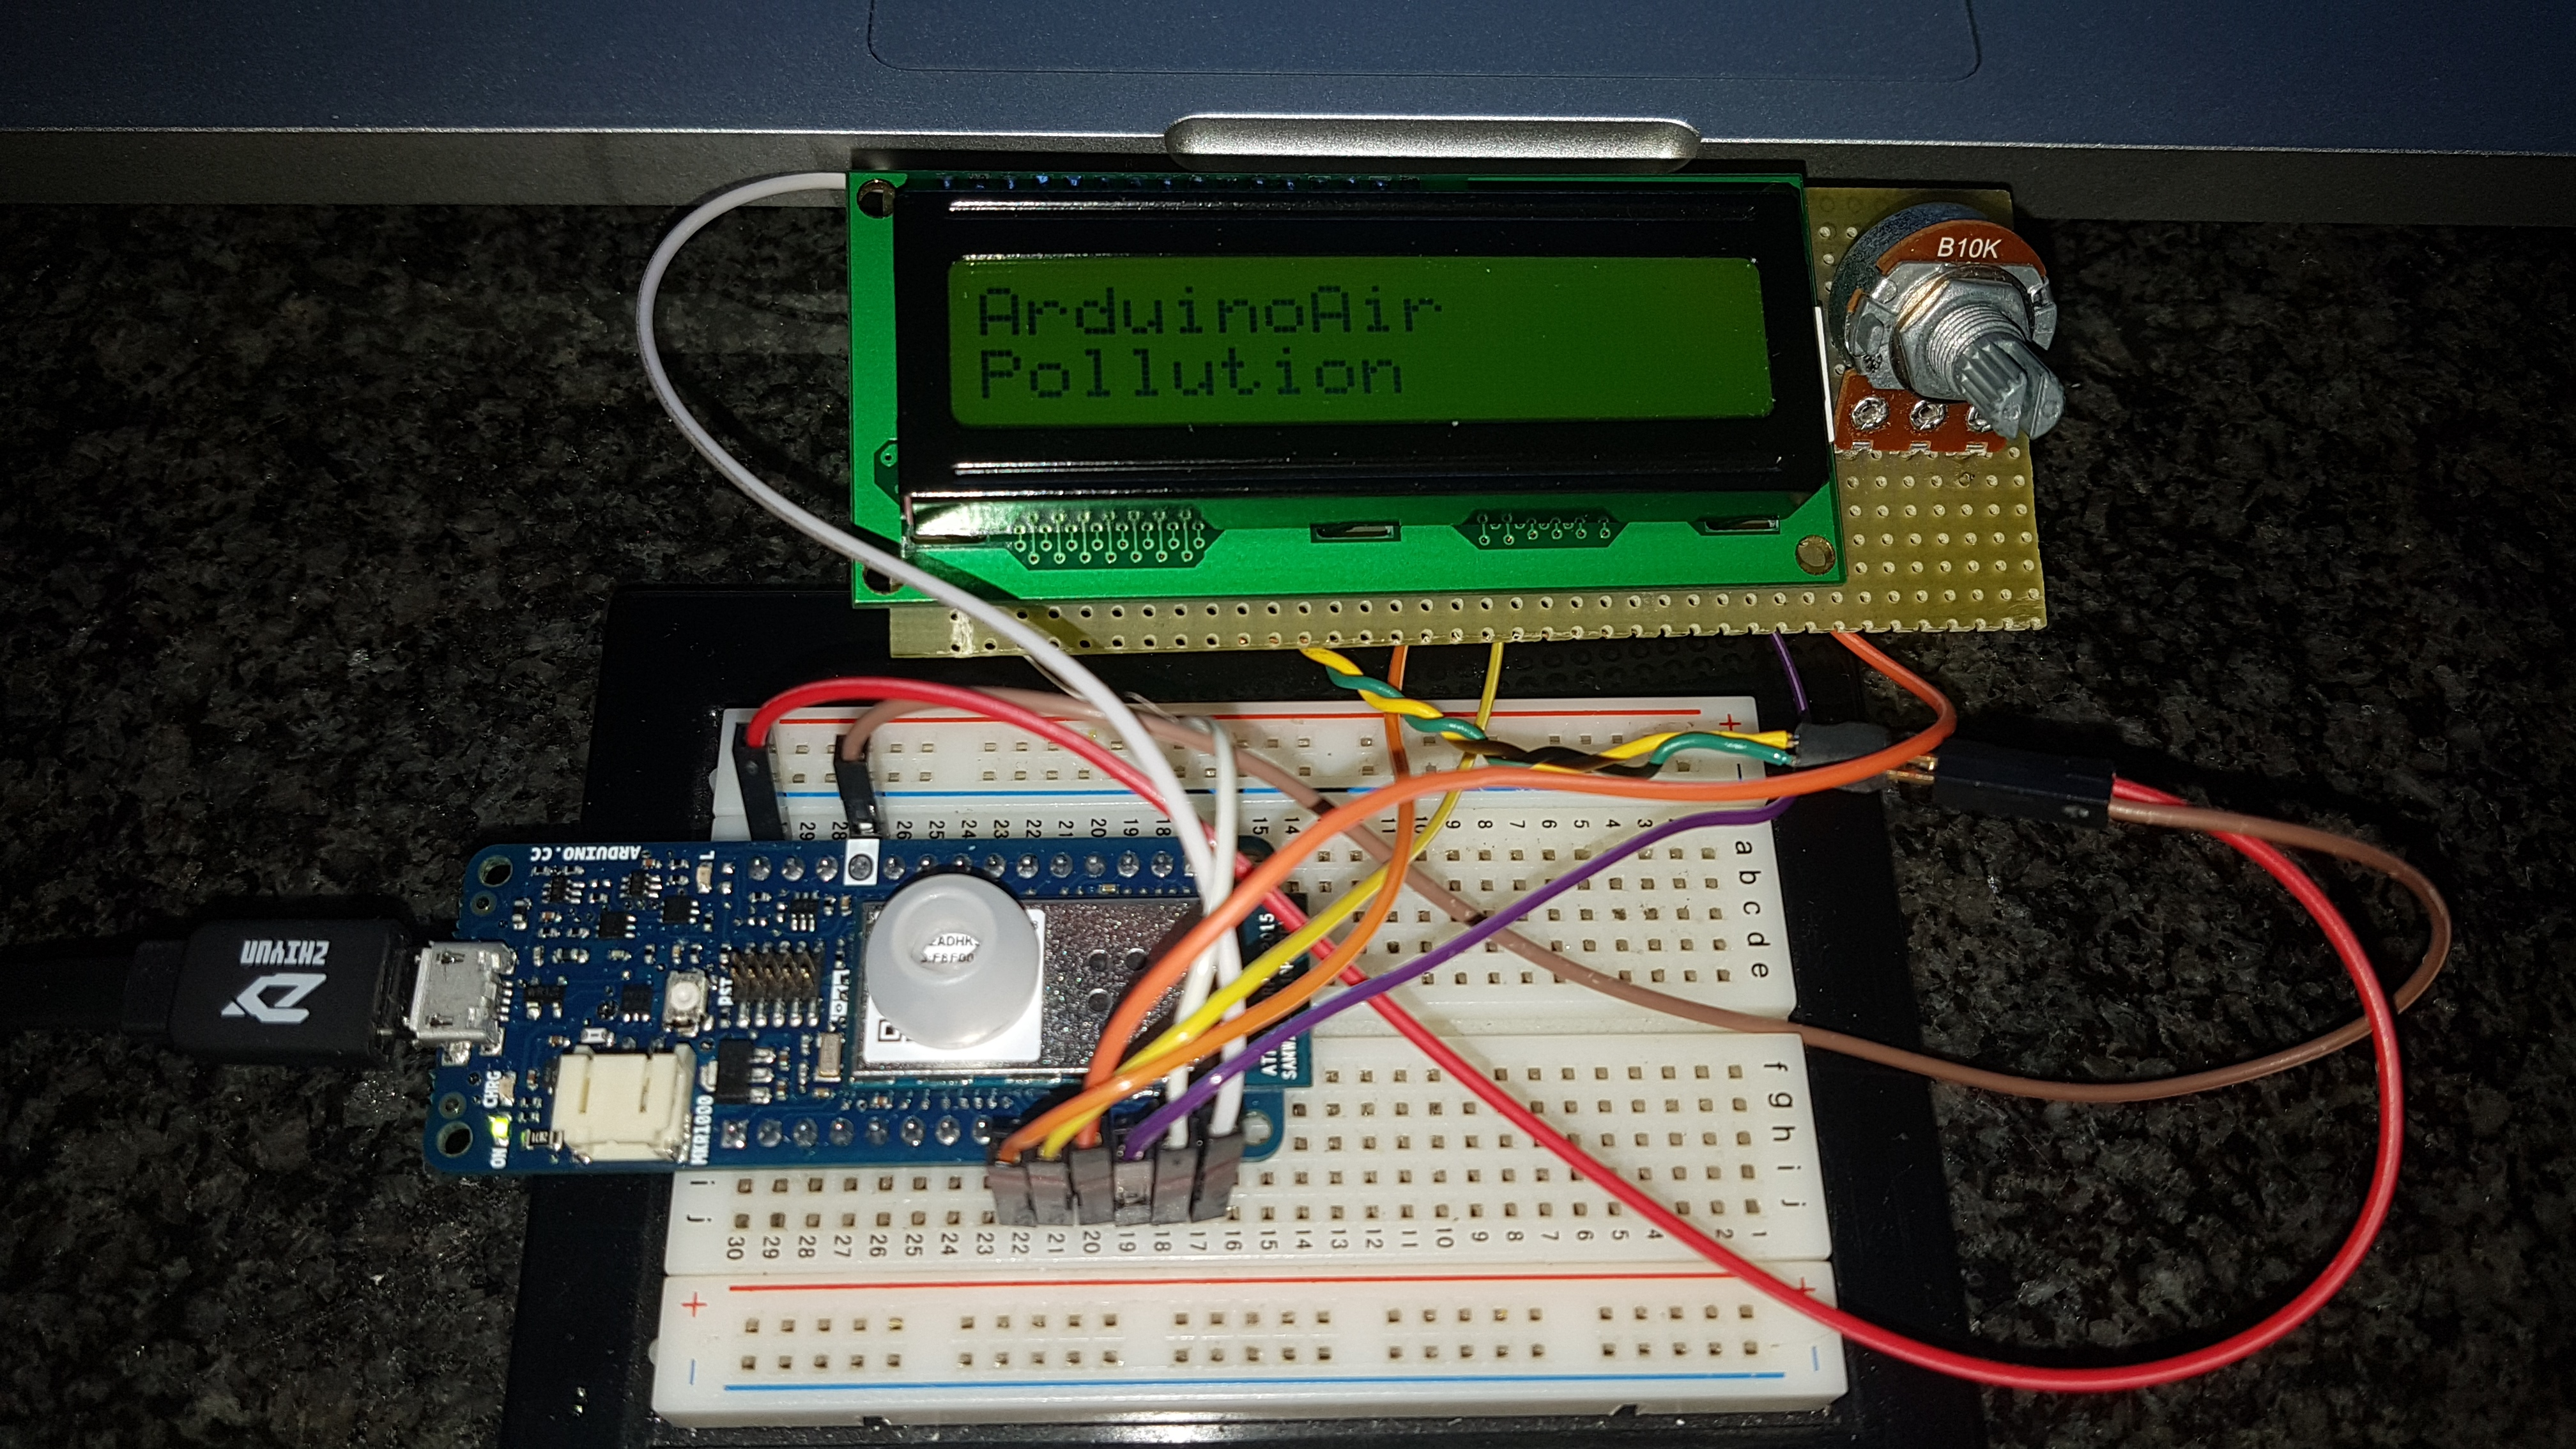 Tutorial: How to use Arduino/Genuino MKR1000 Display LCD HD44780 (16x2)